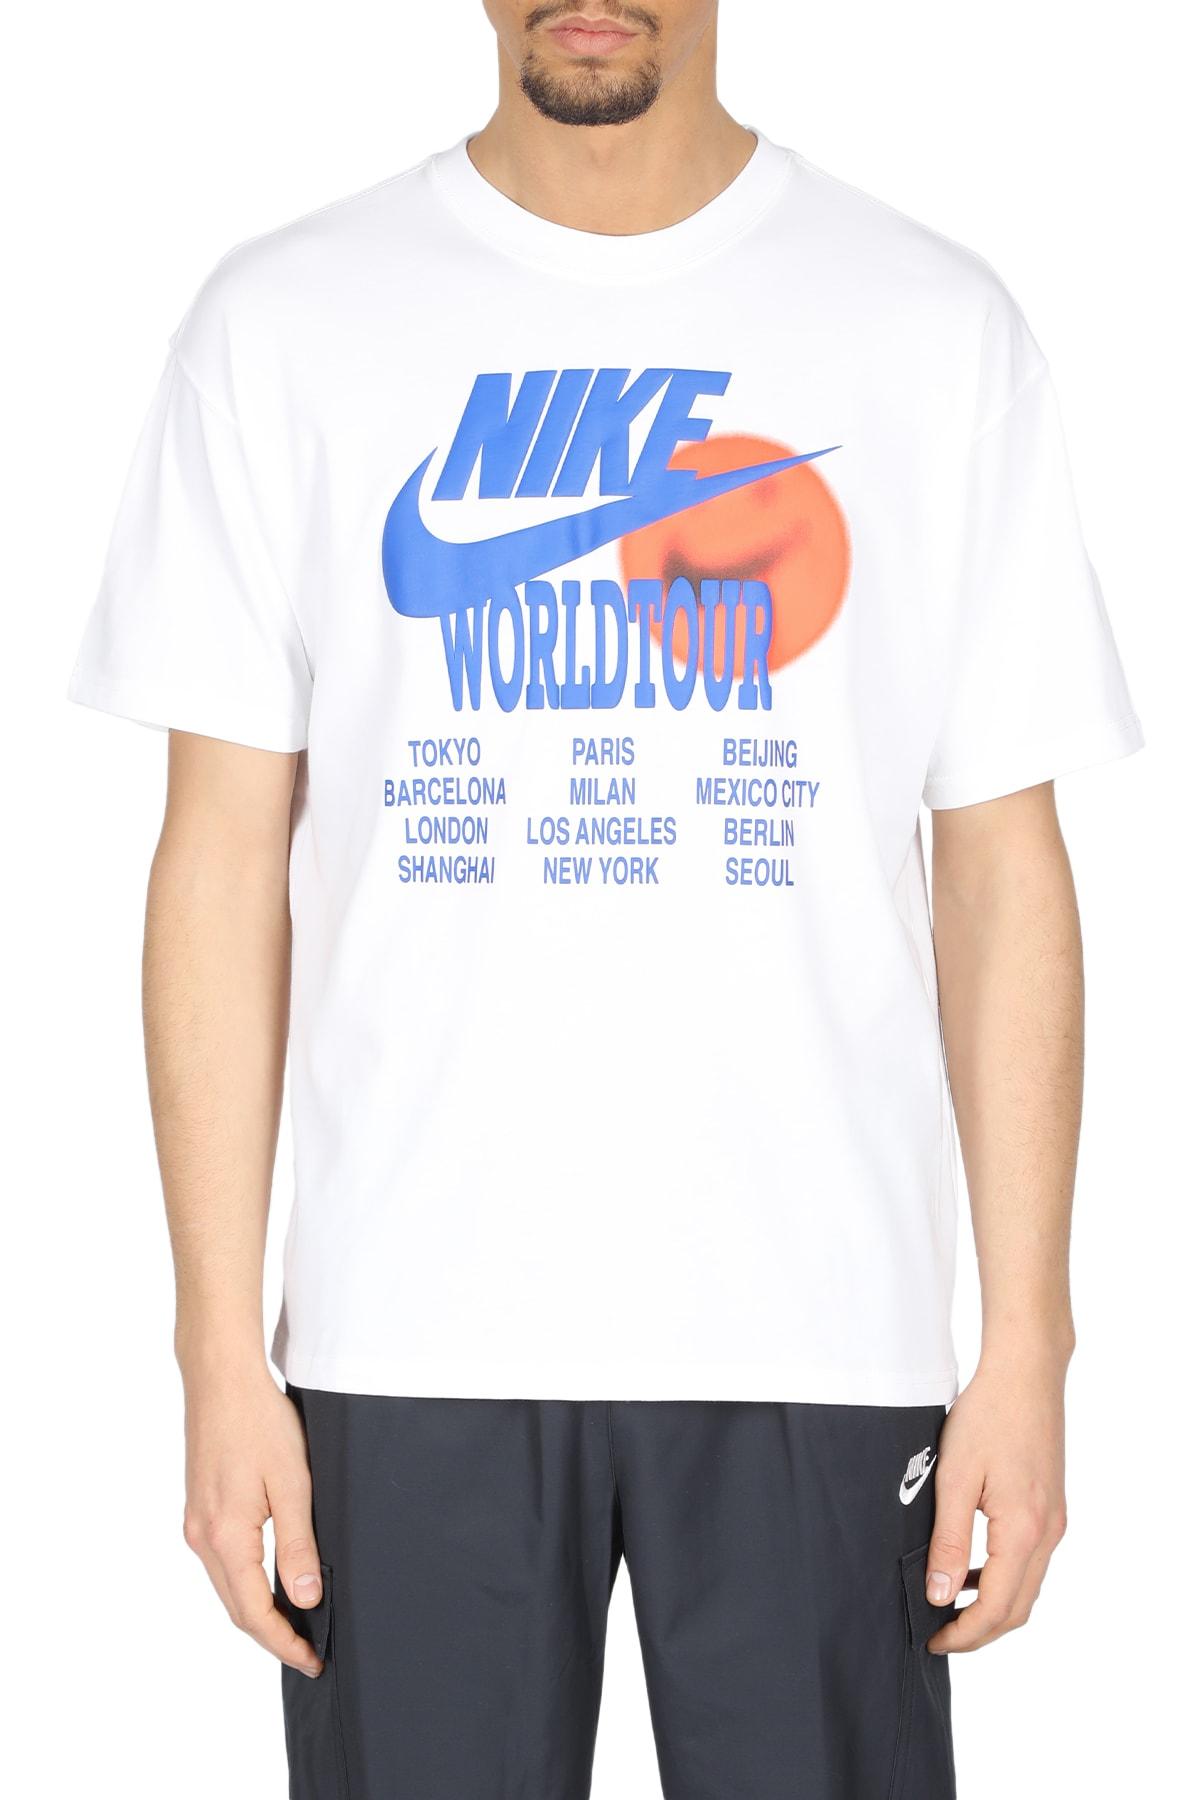 Nike Cottons WORLDTOUR T-SHIRT